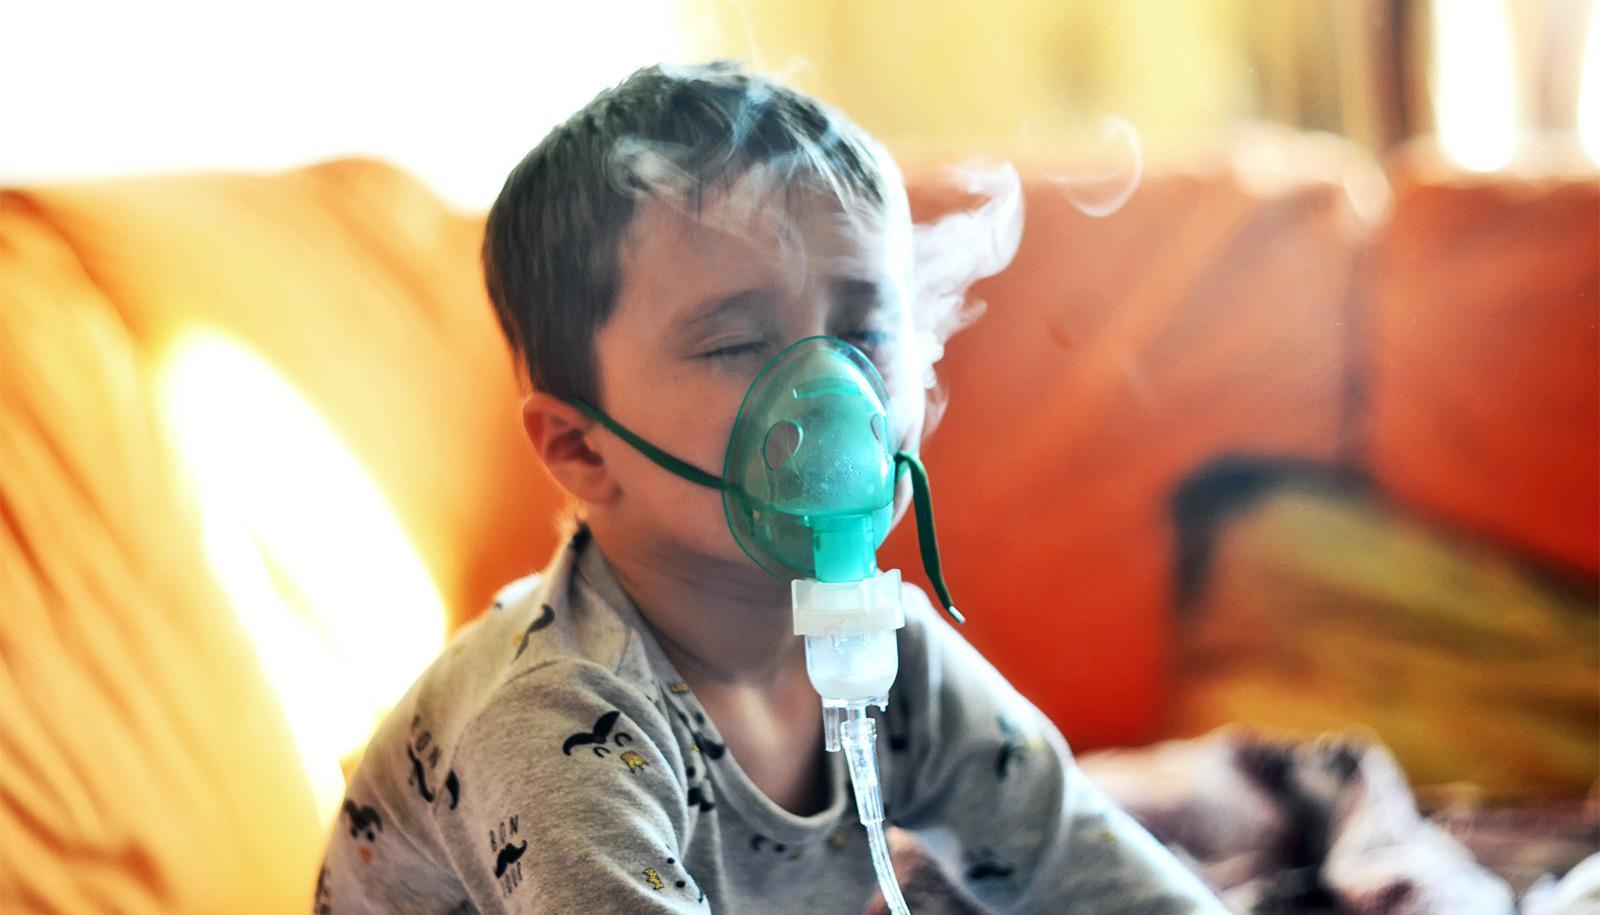 A boy breathes through a nebulizer